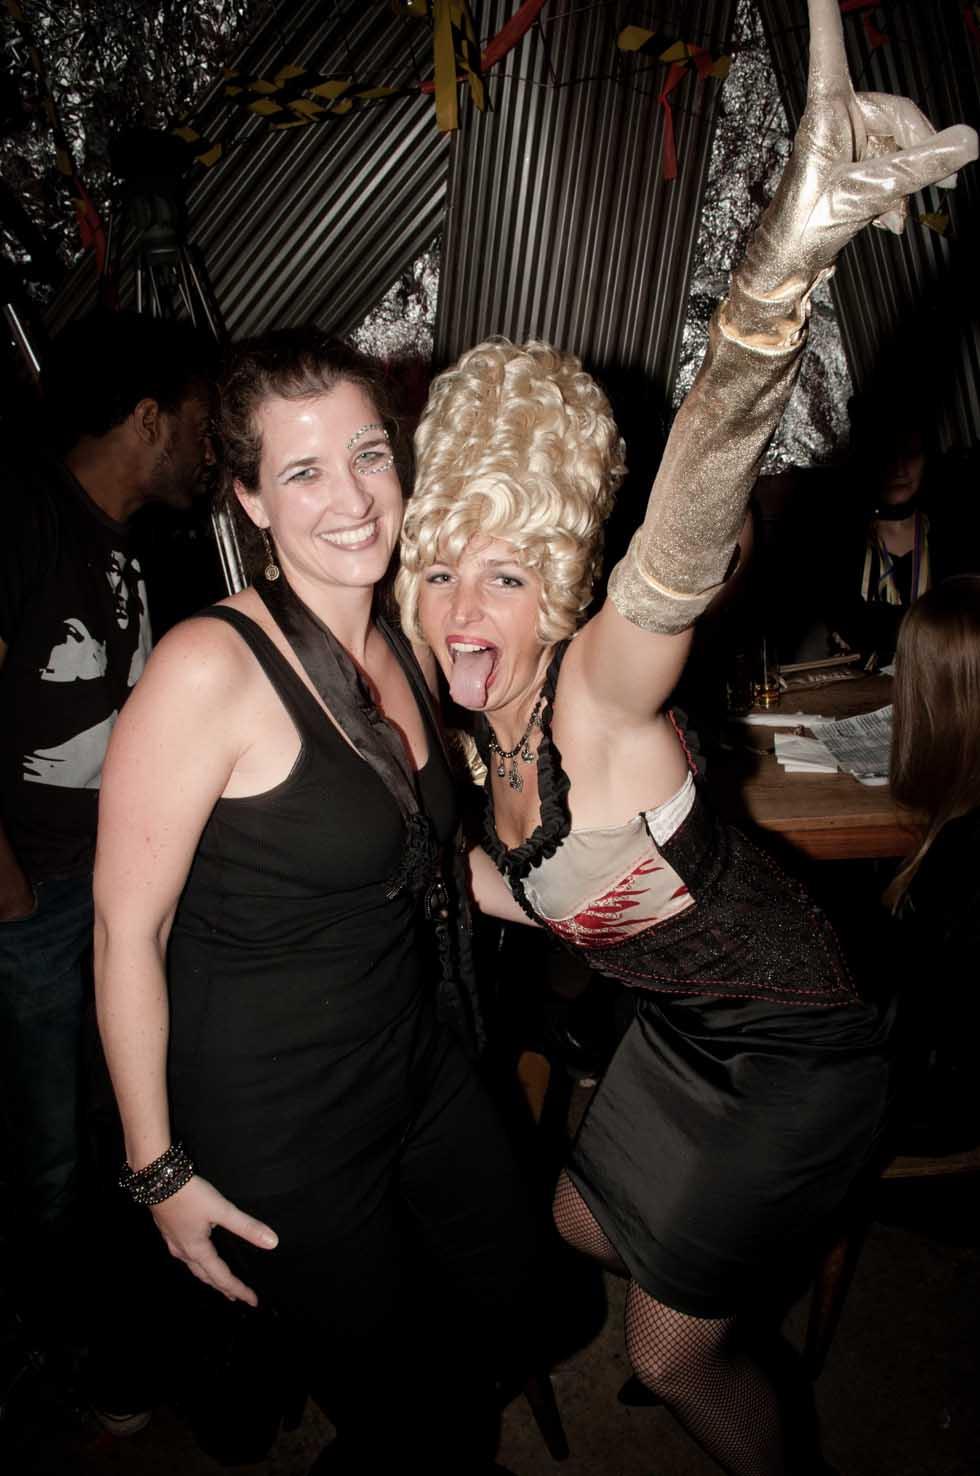 zum-schneider-nyc-2012-karneval-apocalyptika-3526.jpg